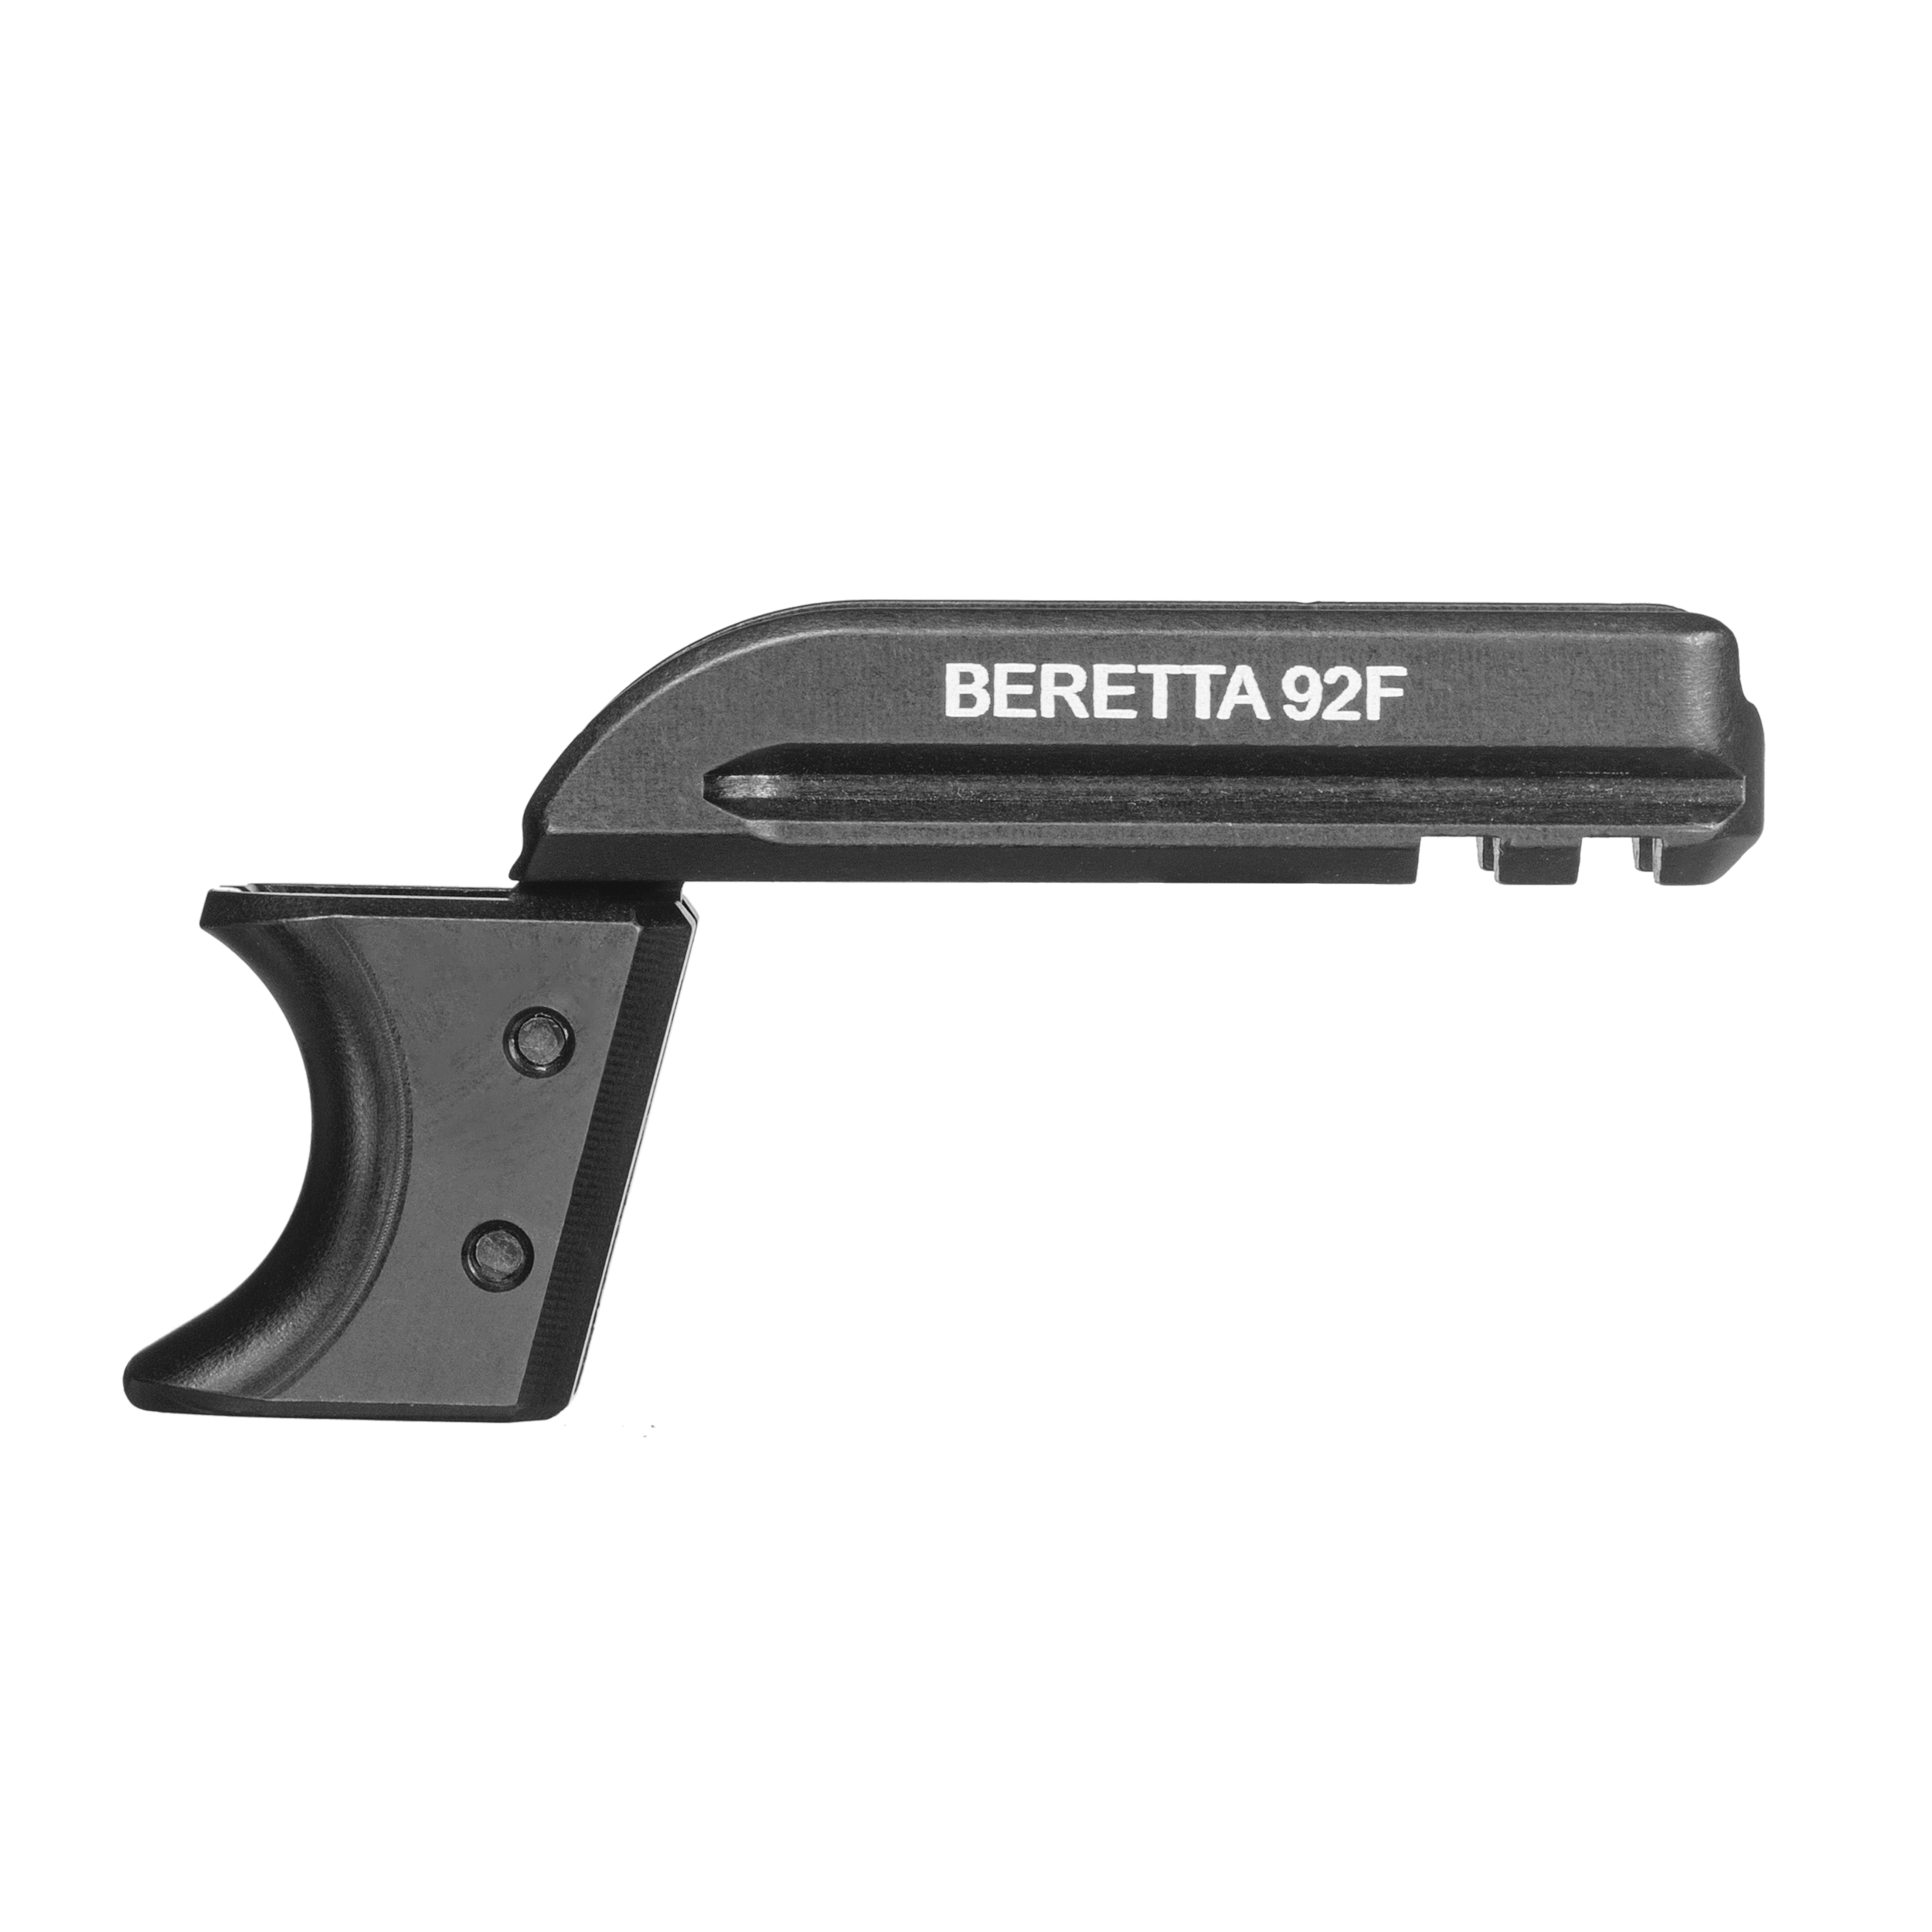 Beretta 92 Picatinny Rail